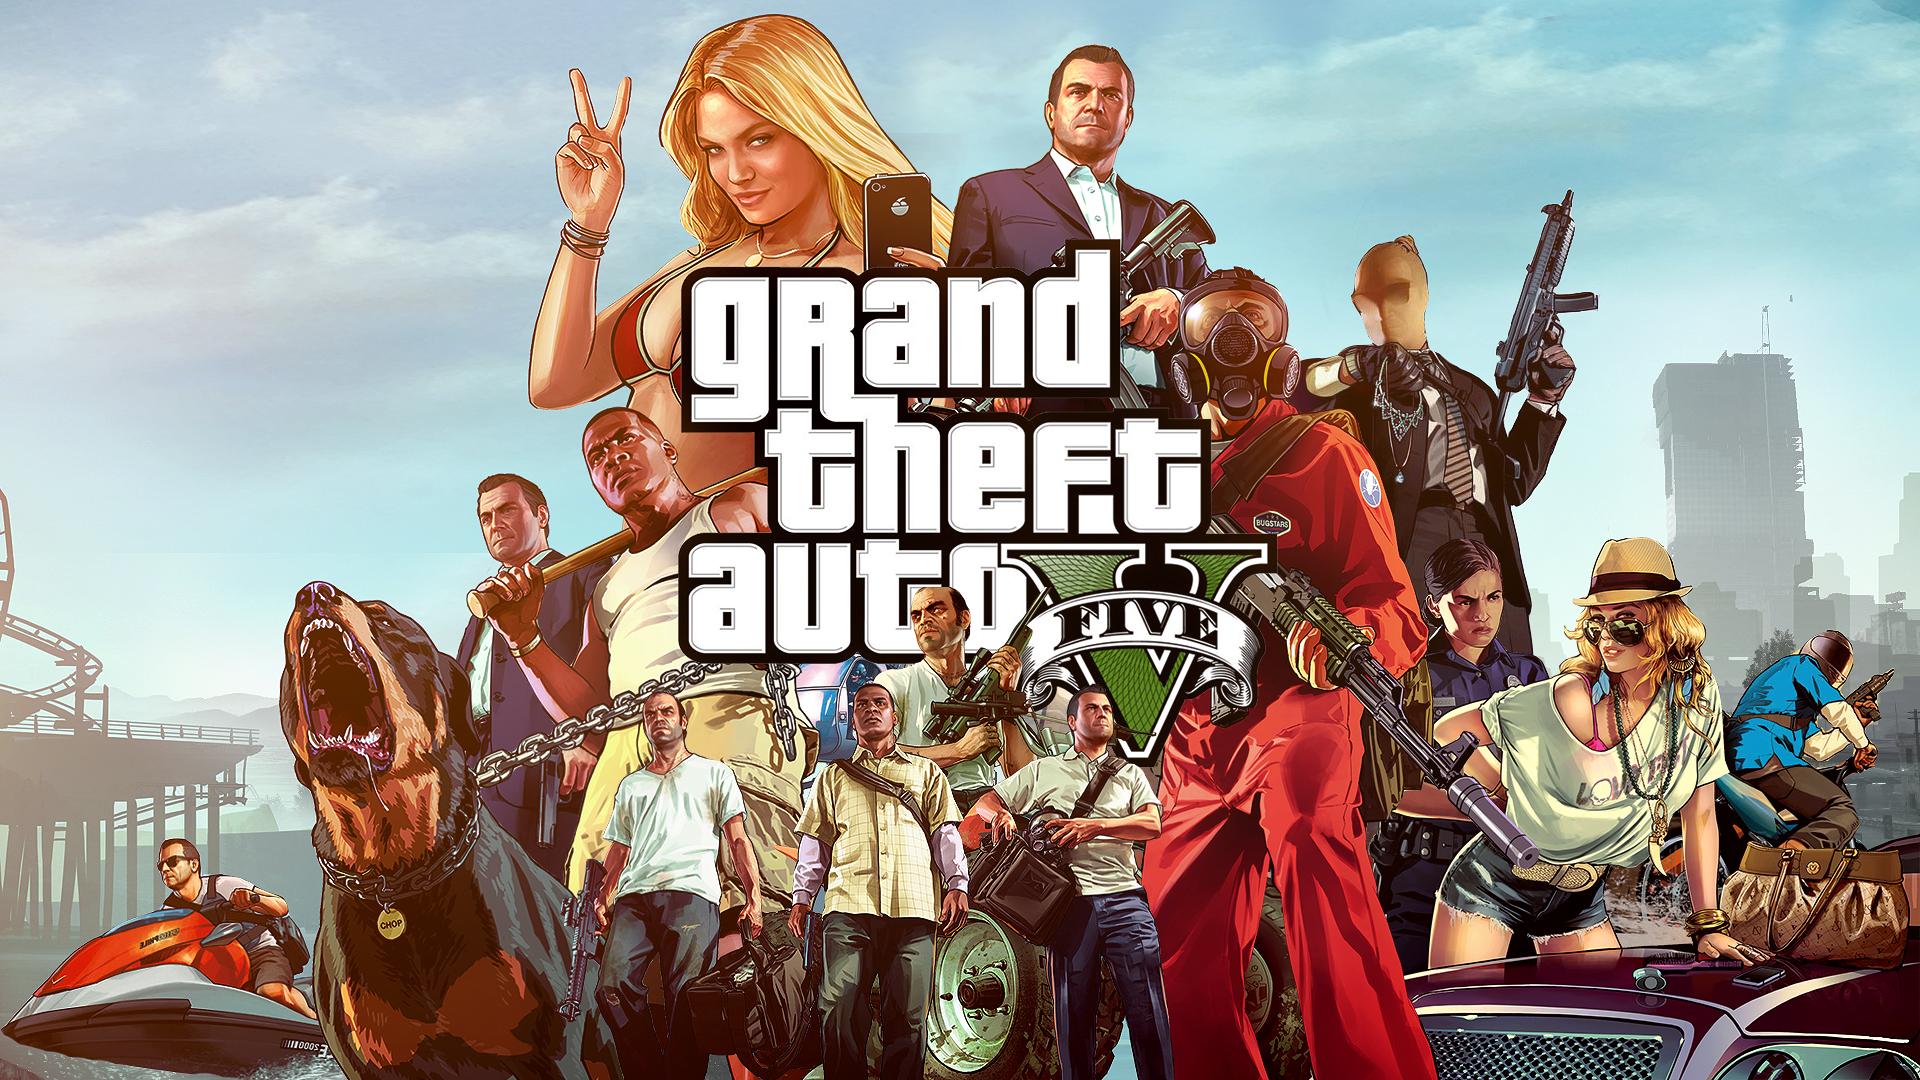 Grand Theft Auto V Wallp 2013